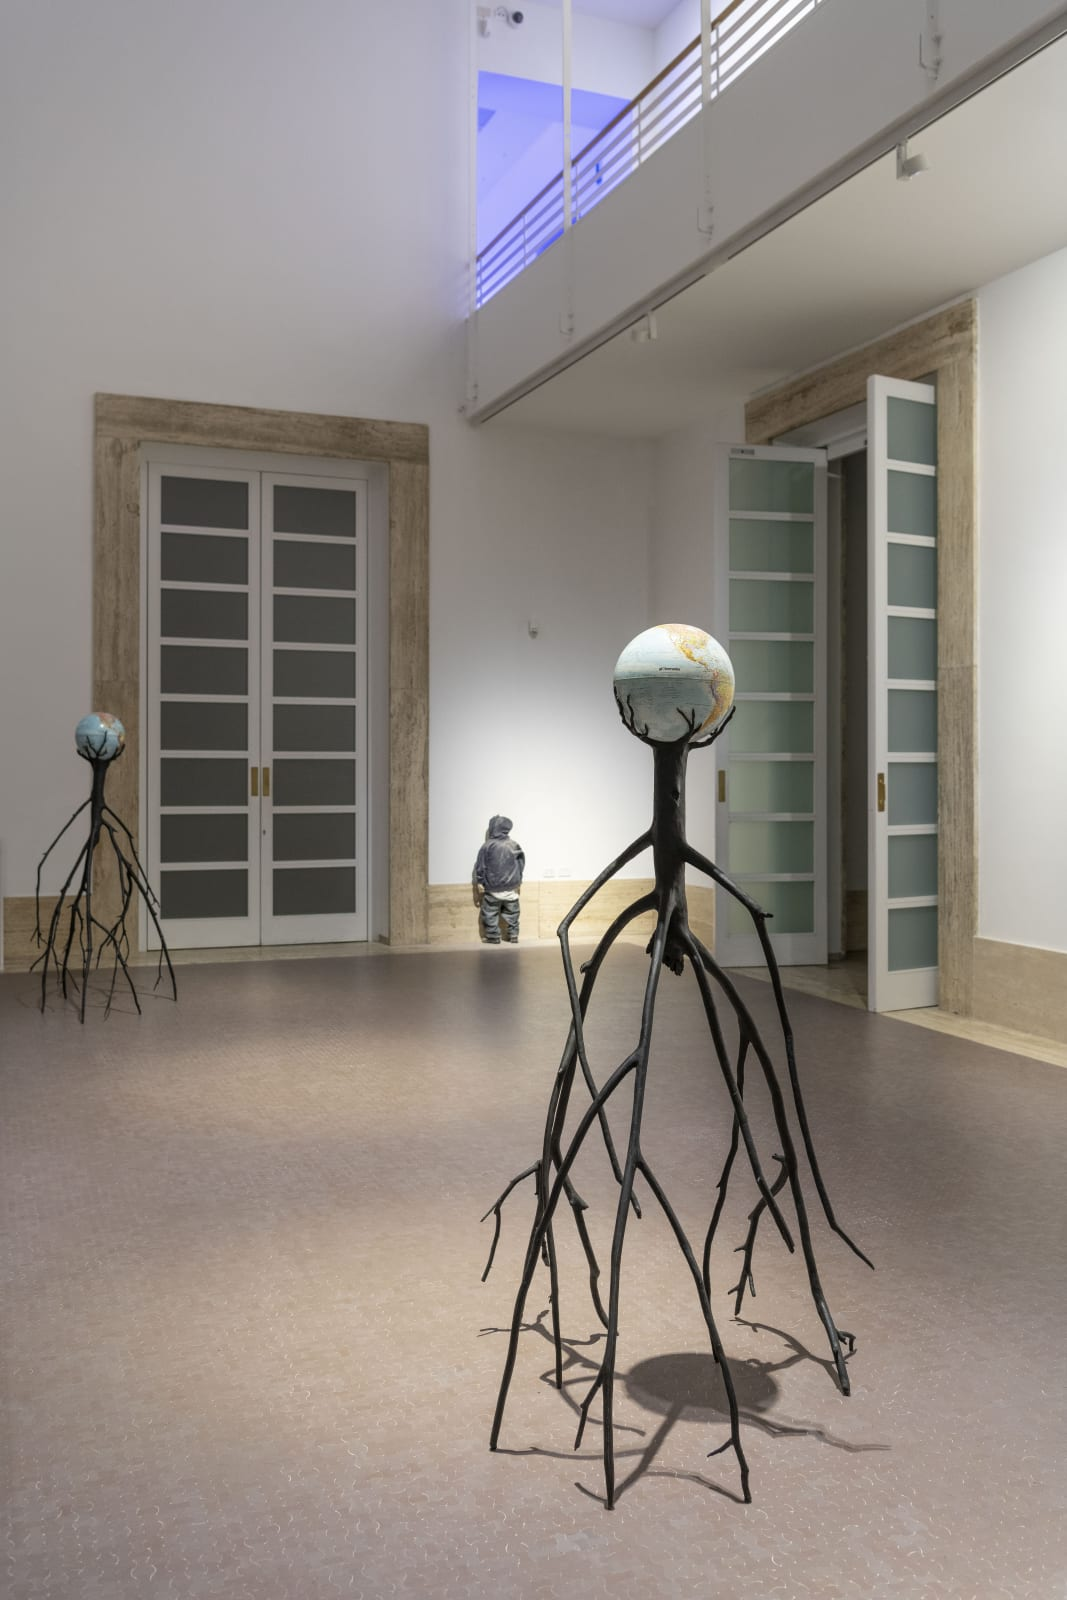 You got to burn to shine, Curated by Teresa Macrì, Galleria Nazionale d'Arte Moderna, Rome